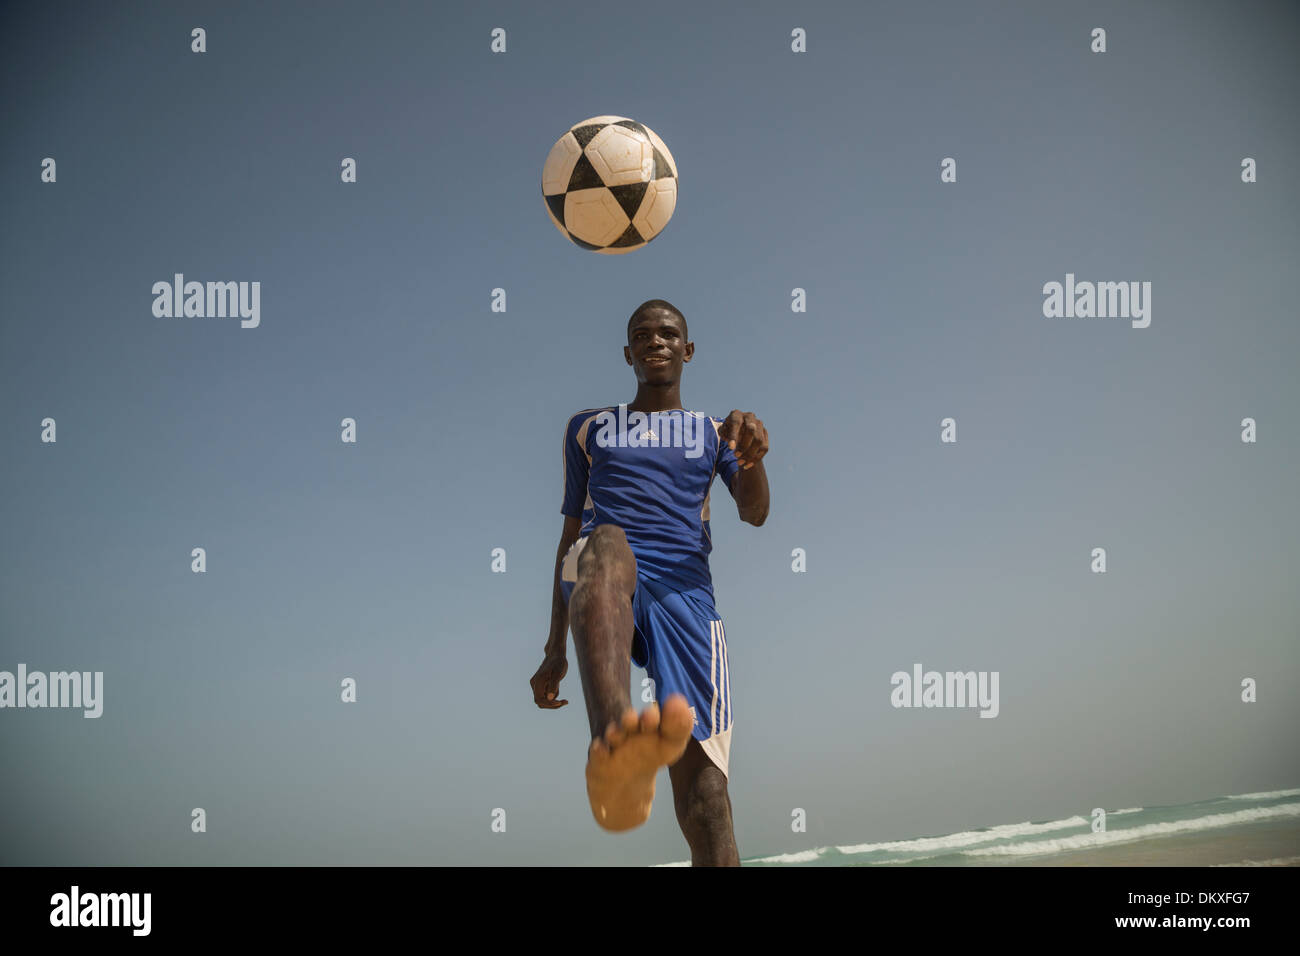 Football player on the beach in Dakar, Senegal. - Stock Image